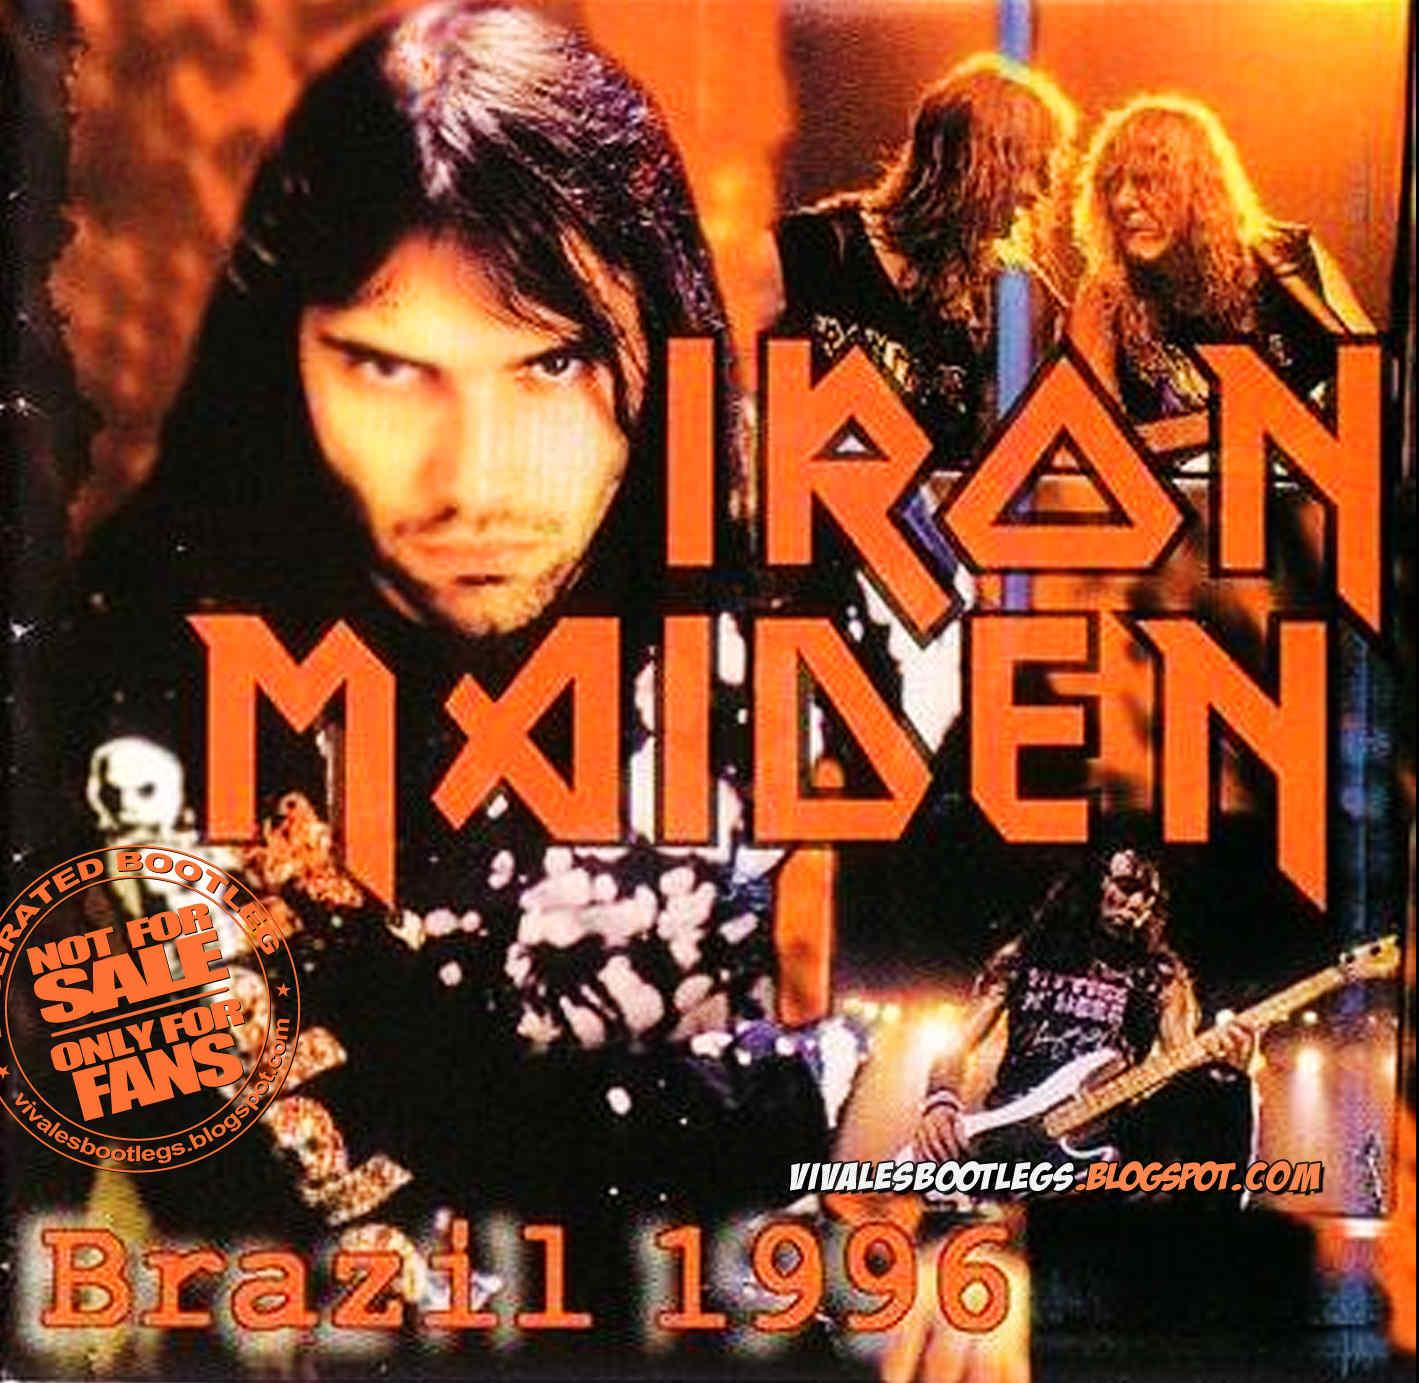 iron maiden best of flac torrent